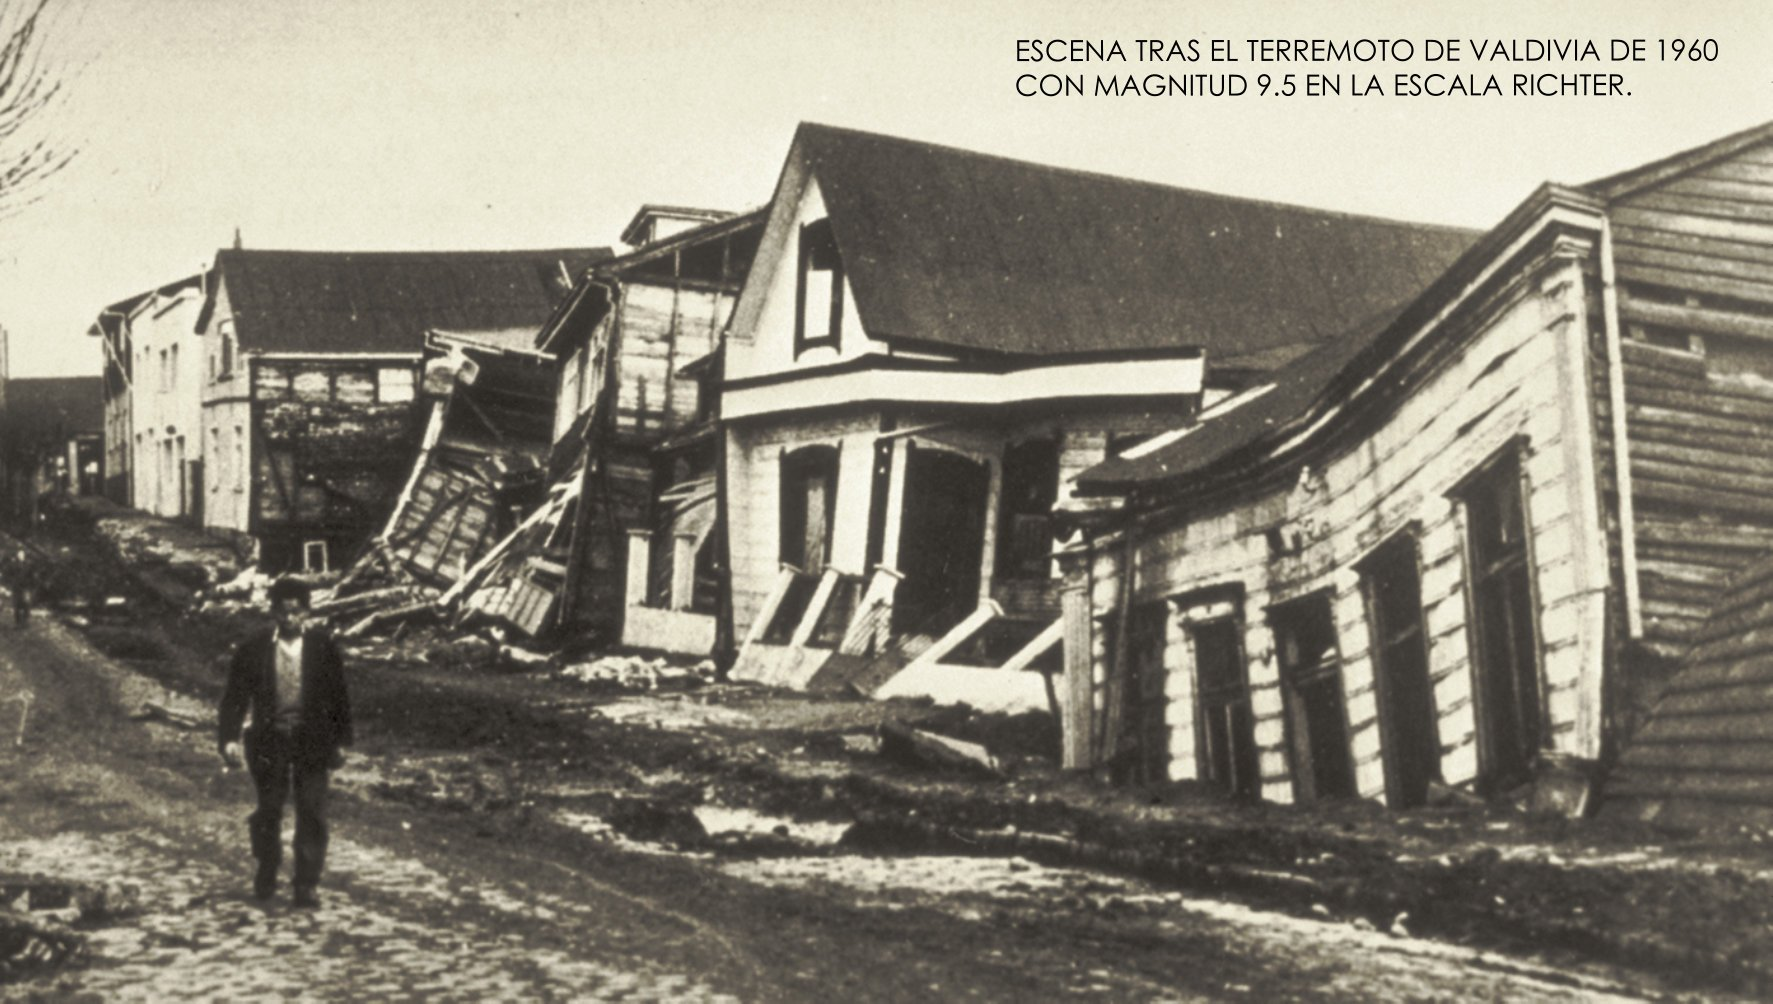 Terremoto De Valdivia, Planeta Incógnito